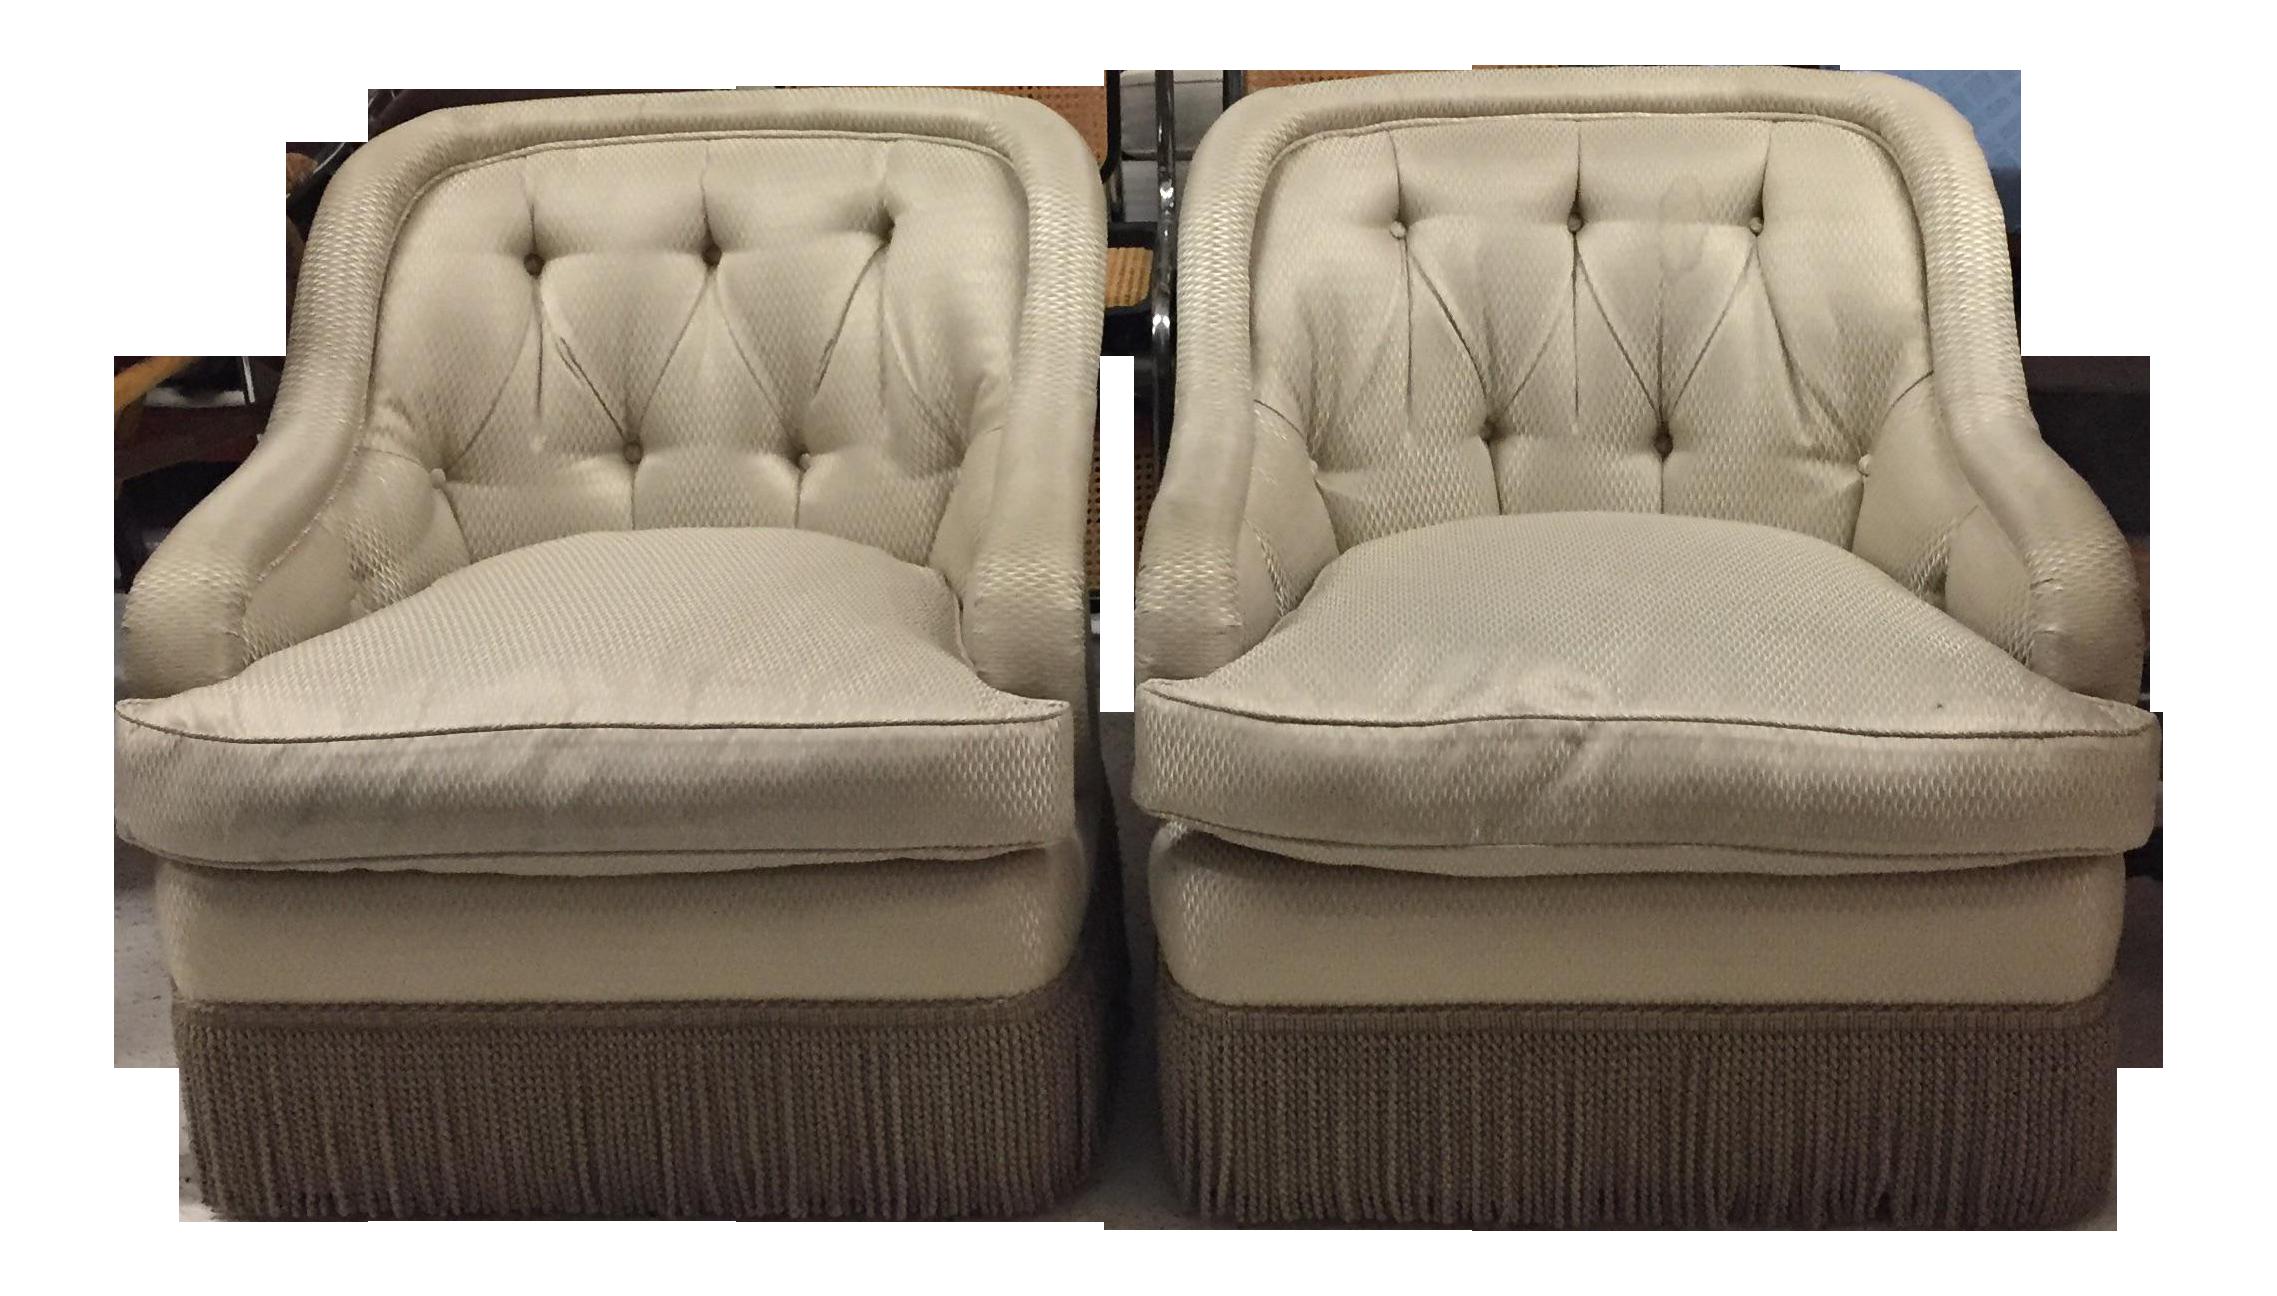 Merveilleux Fringe Trim Tufted Club Chairs   A Pair For Sale